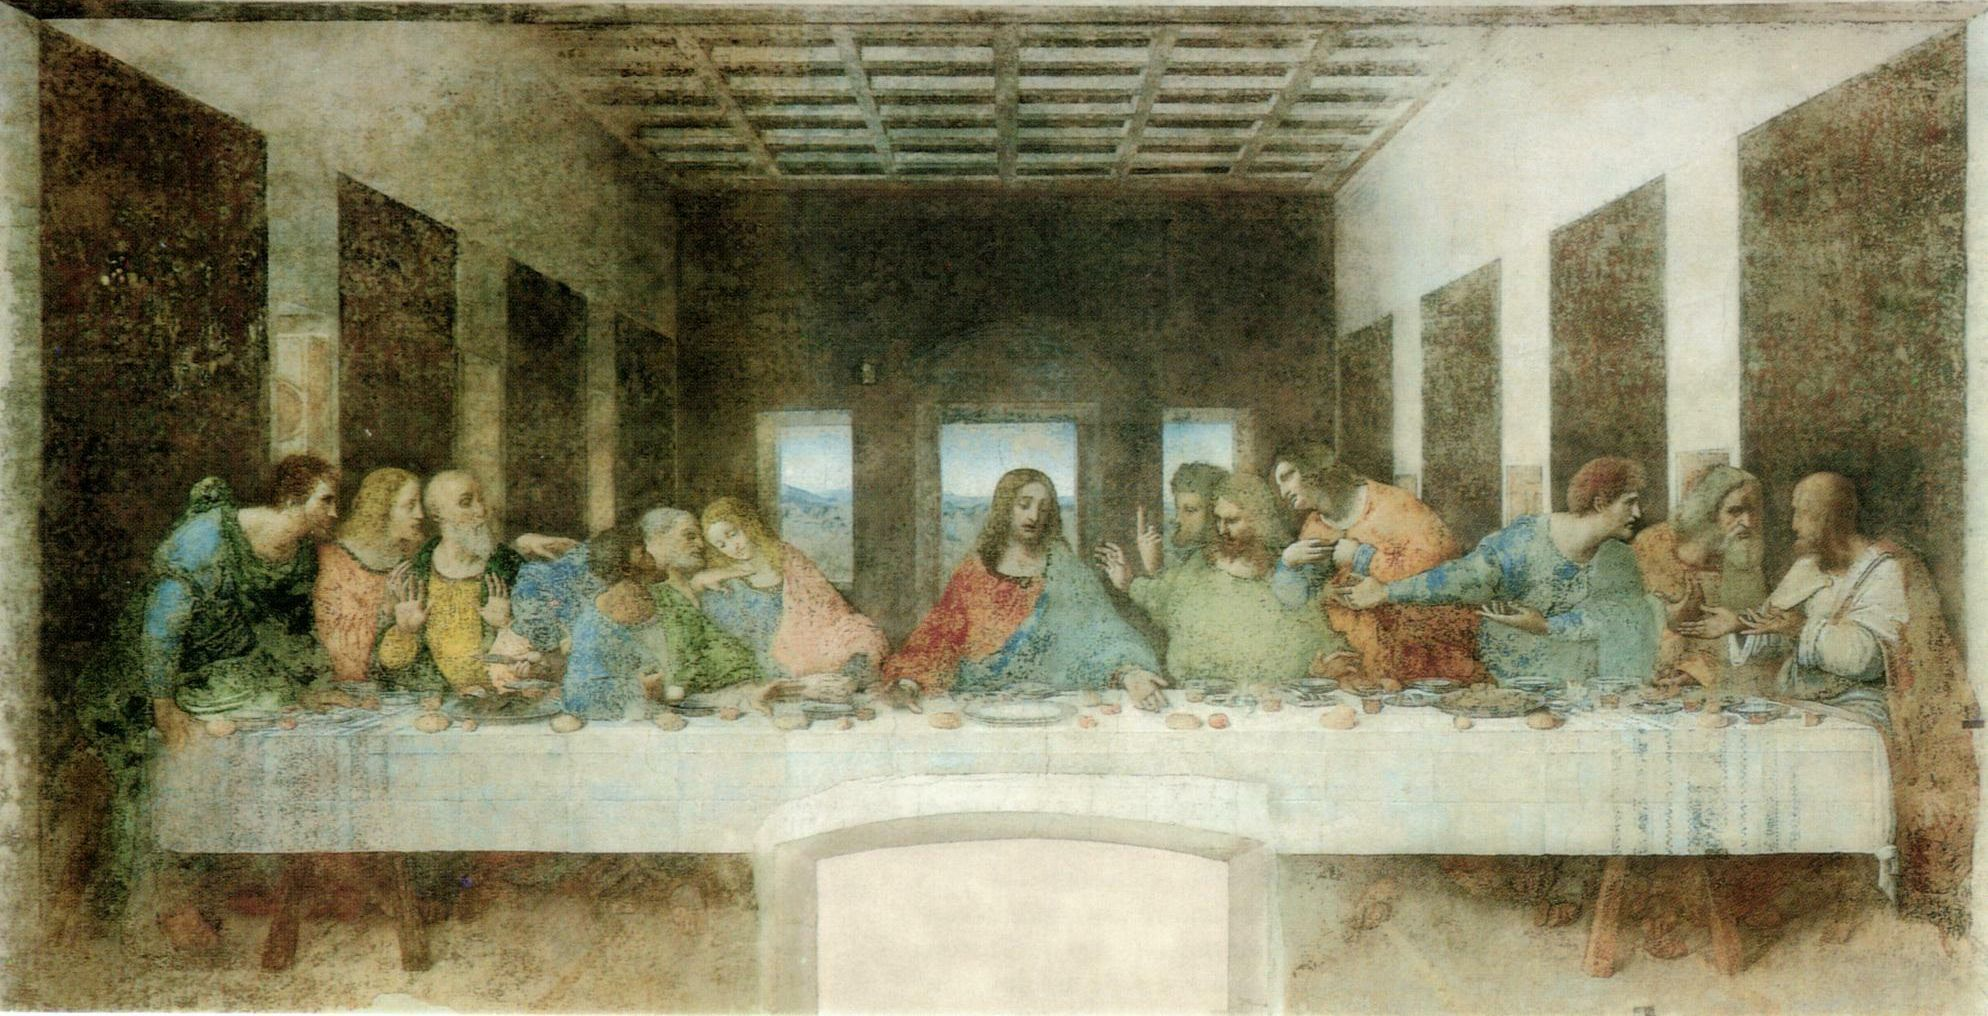 Last Supper (La Cène) by Leonardo Da Vinci, 1495-1498